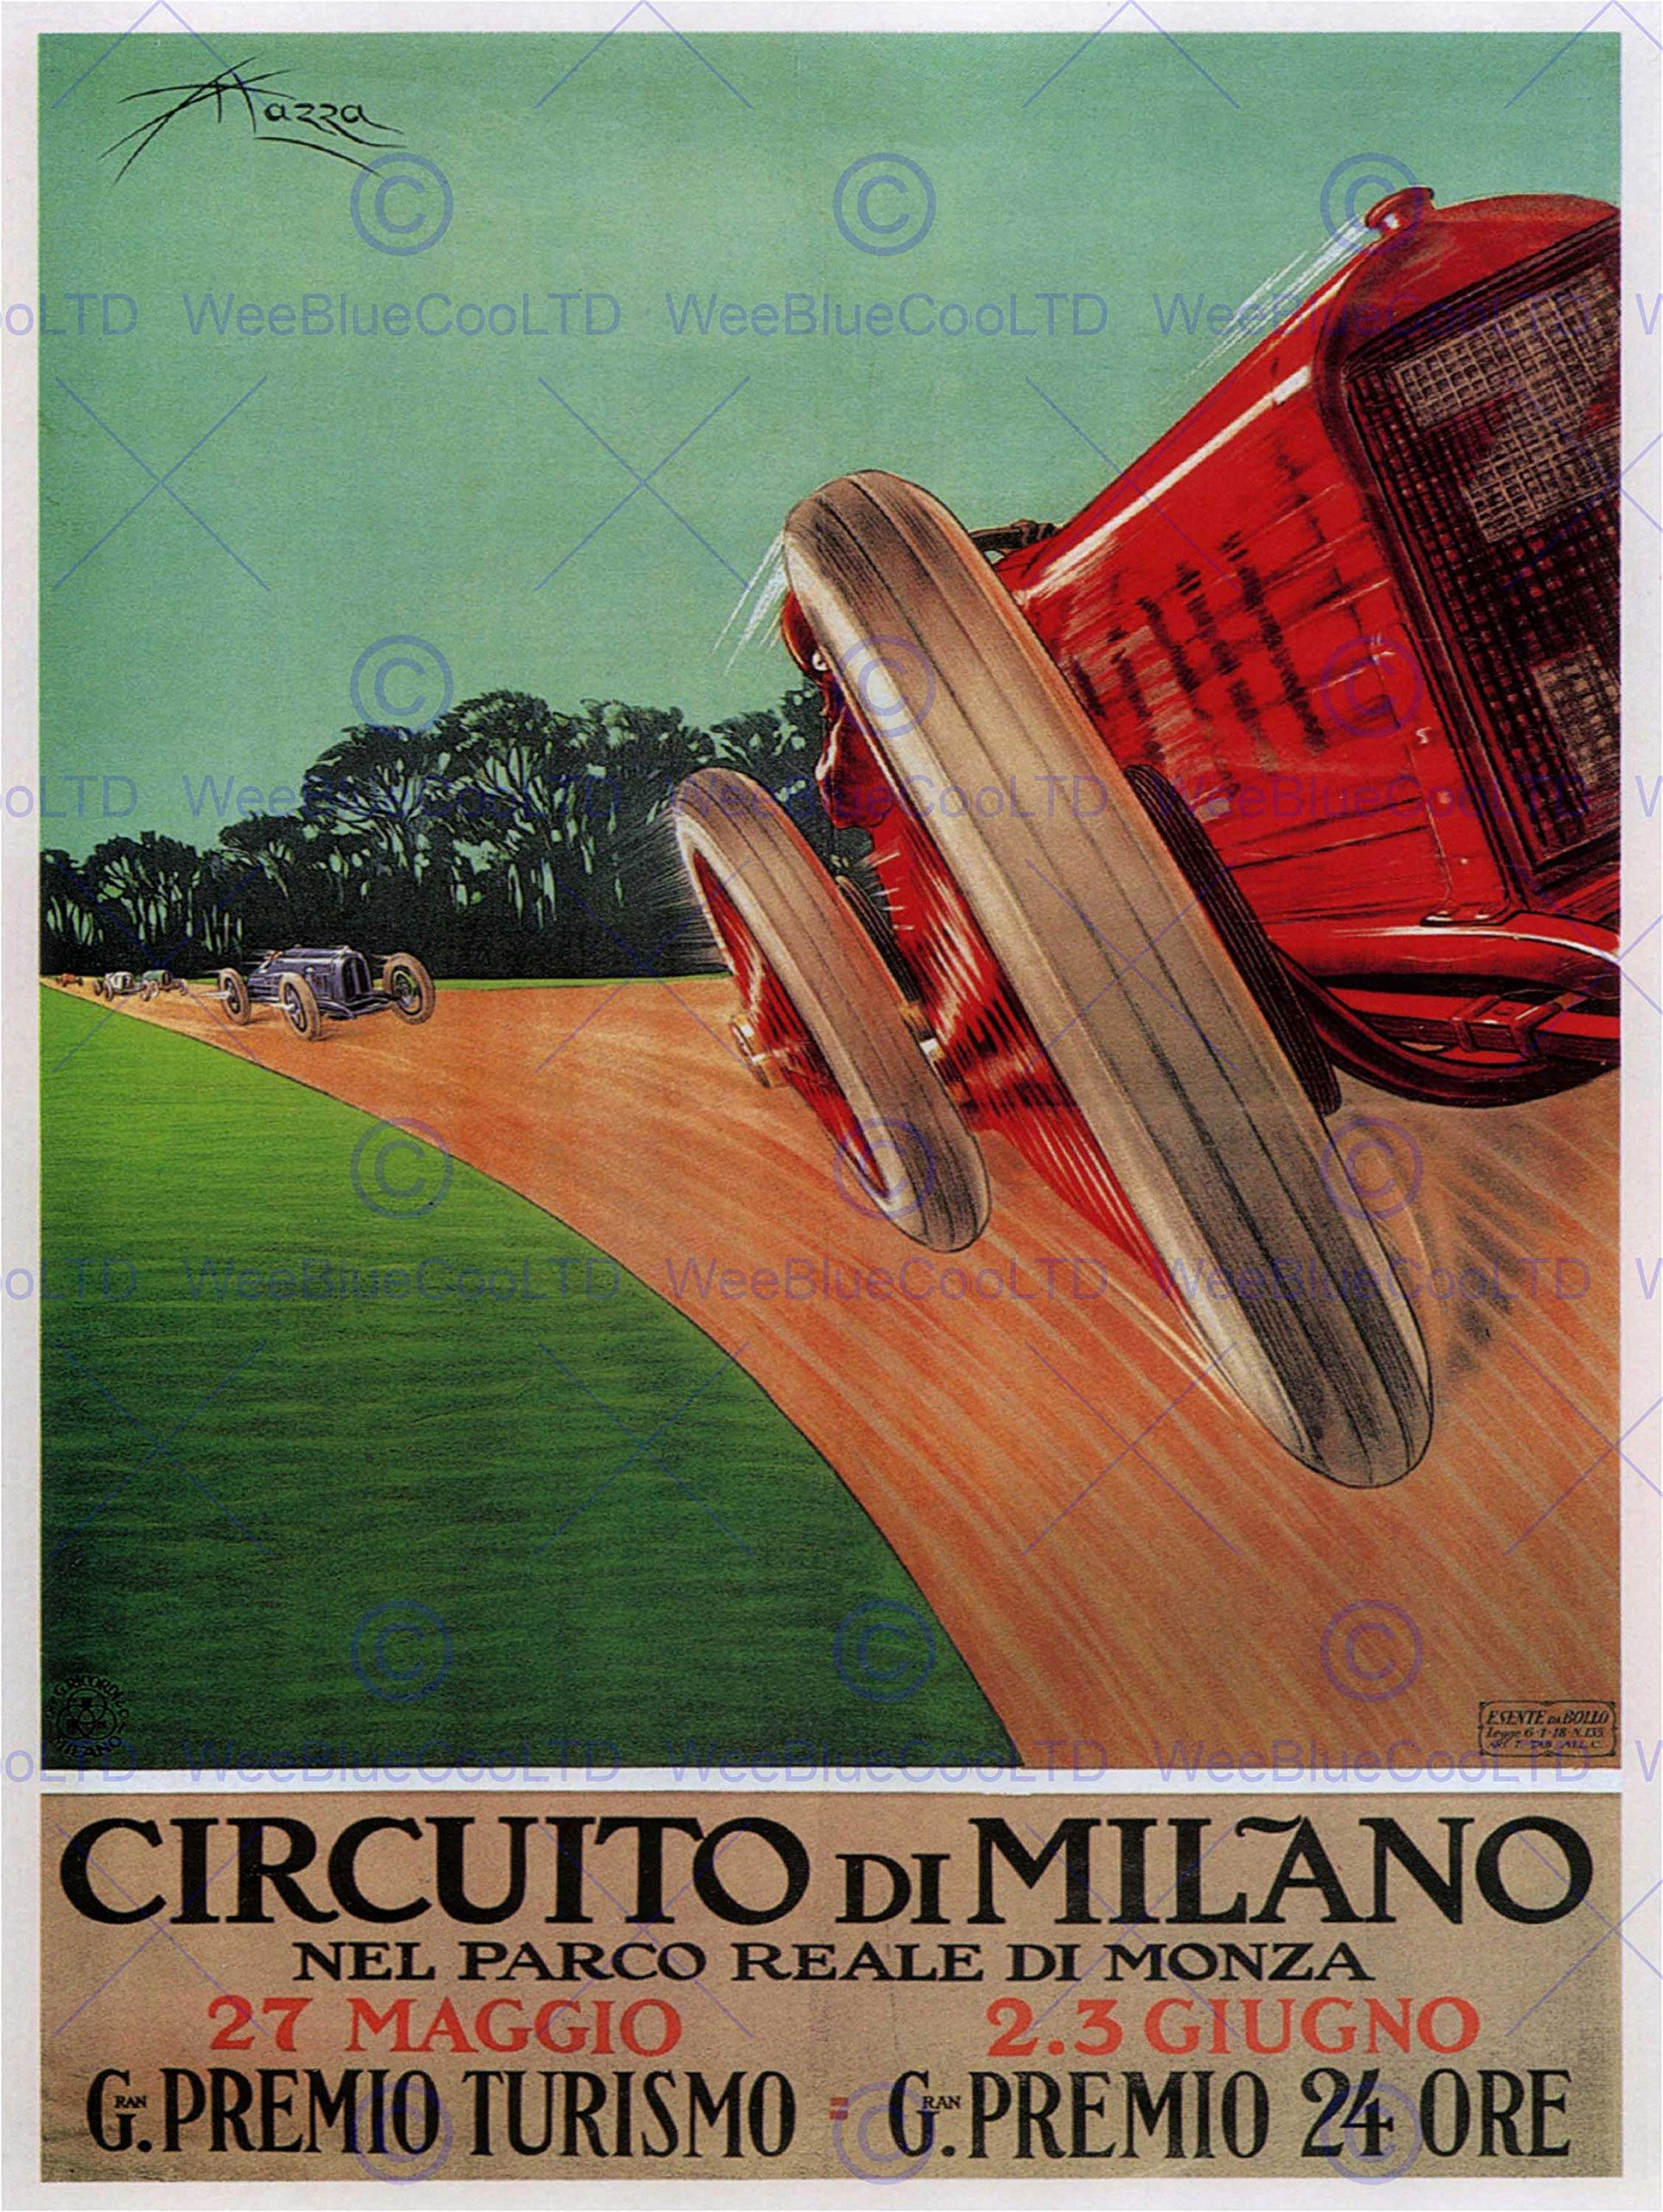 SPORT MOTOR MONZA MILAN ITALY RACING VINTAGE POSTER ART PRINT 12x16 inch 30x40cm 908PY